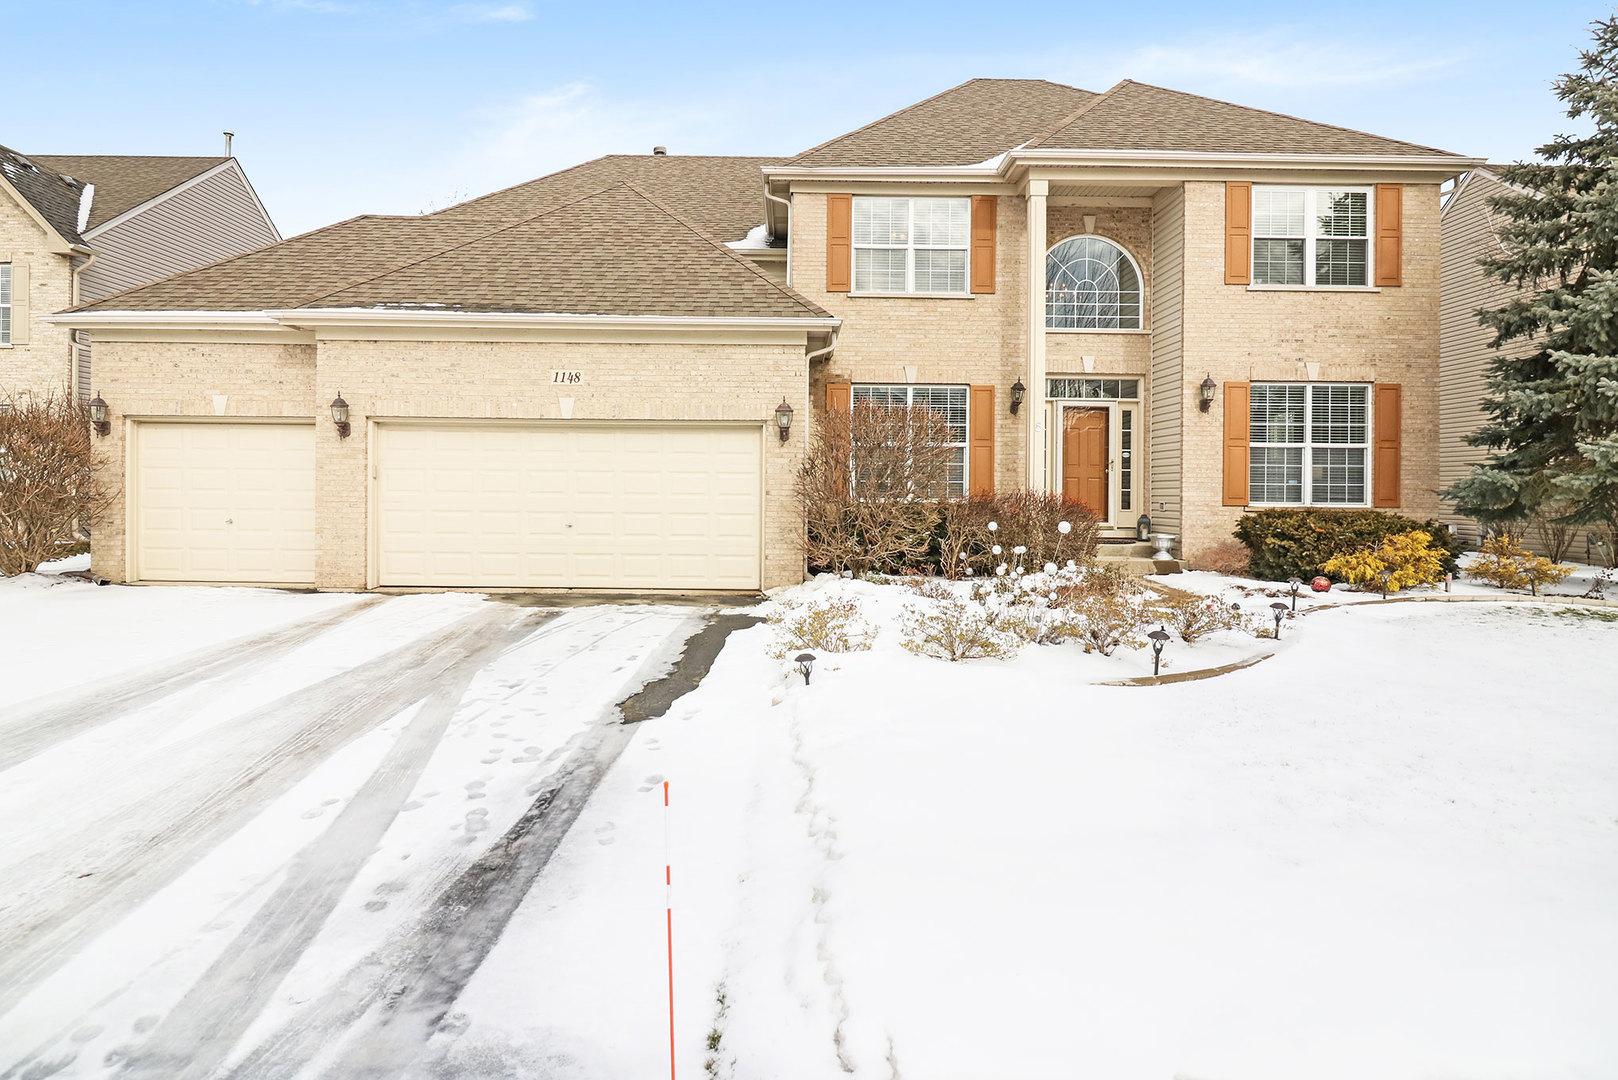 1148 Caledonia Lane, Crystal Lake, IL 60014